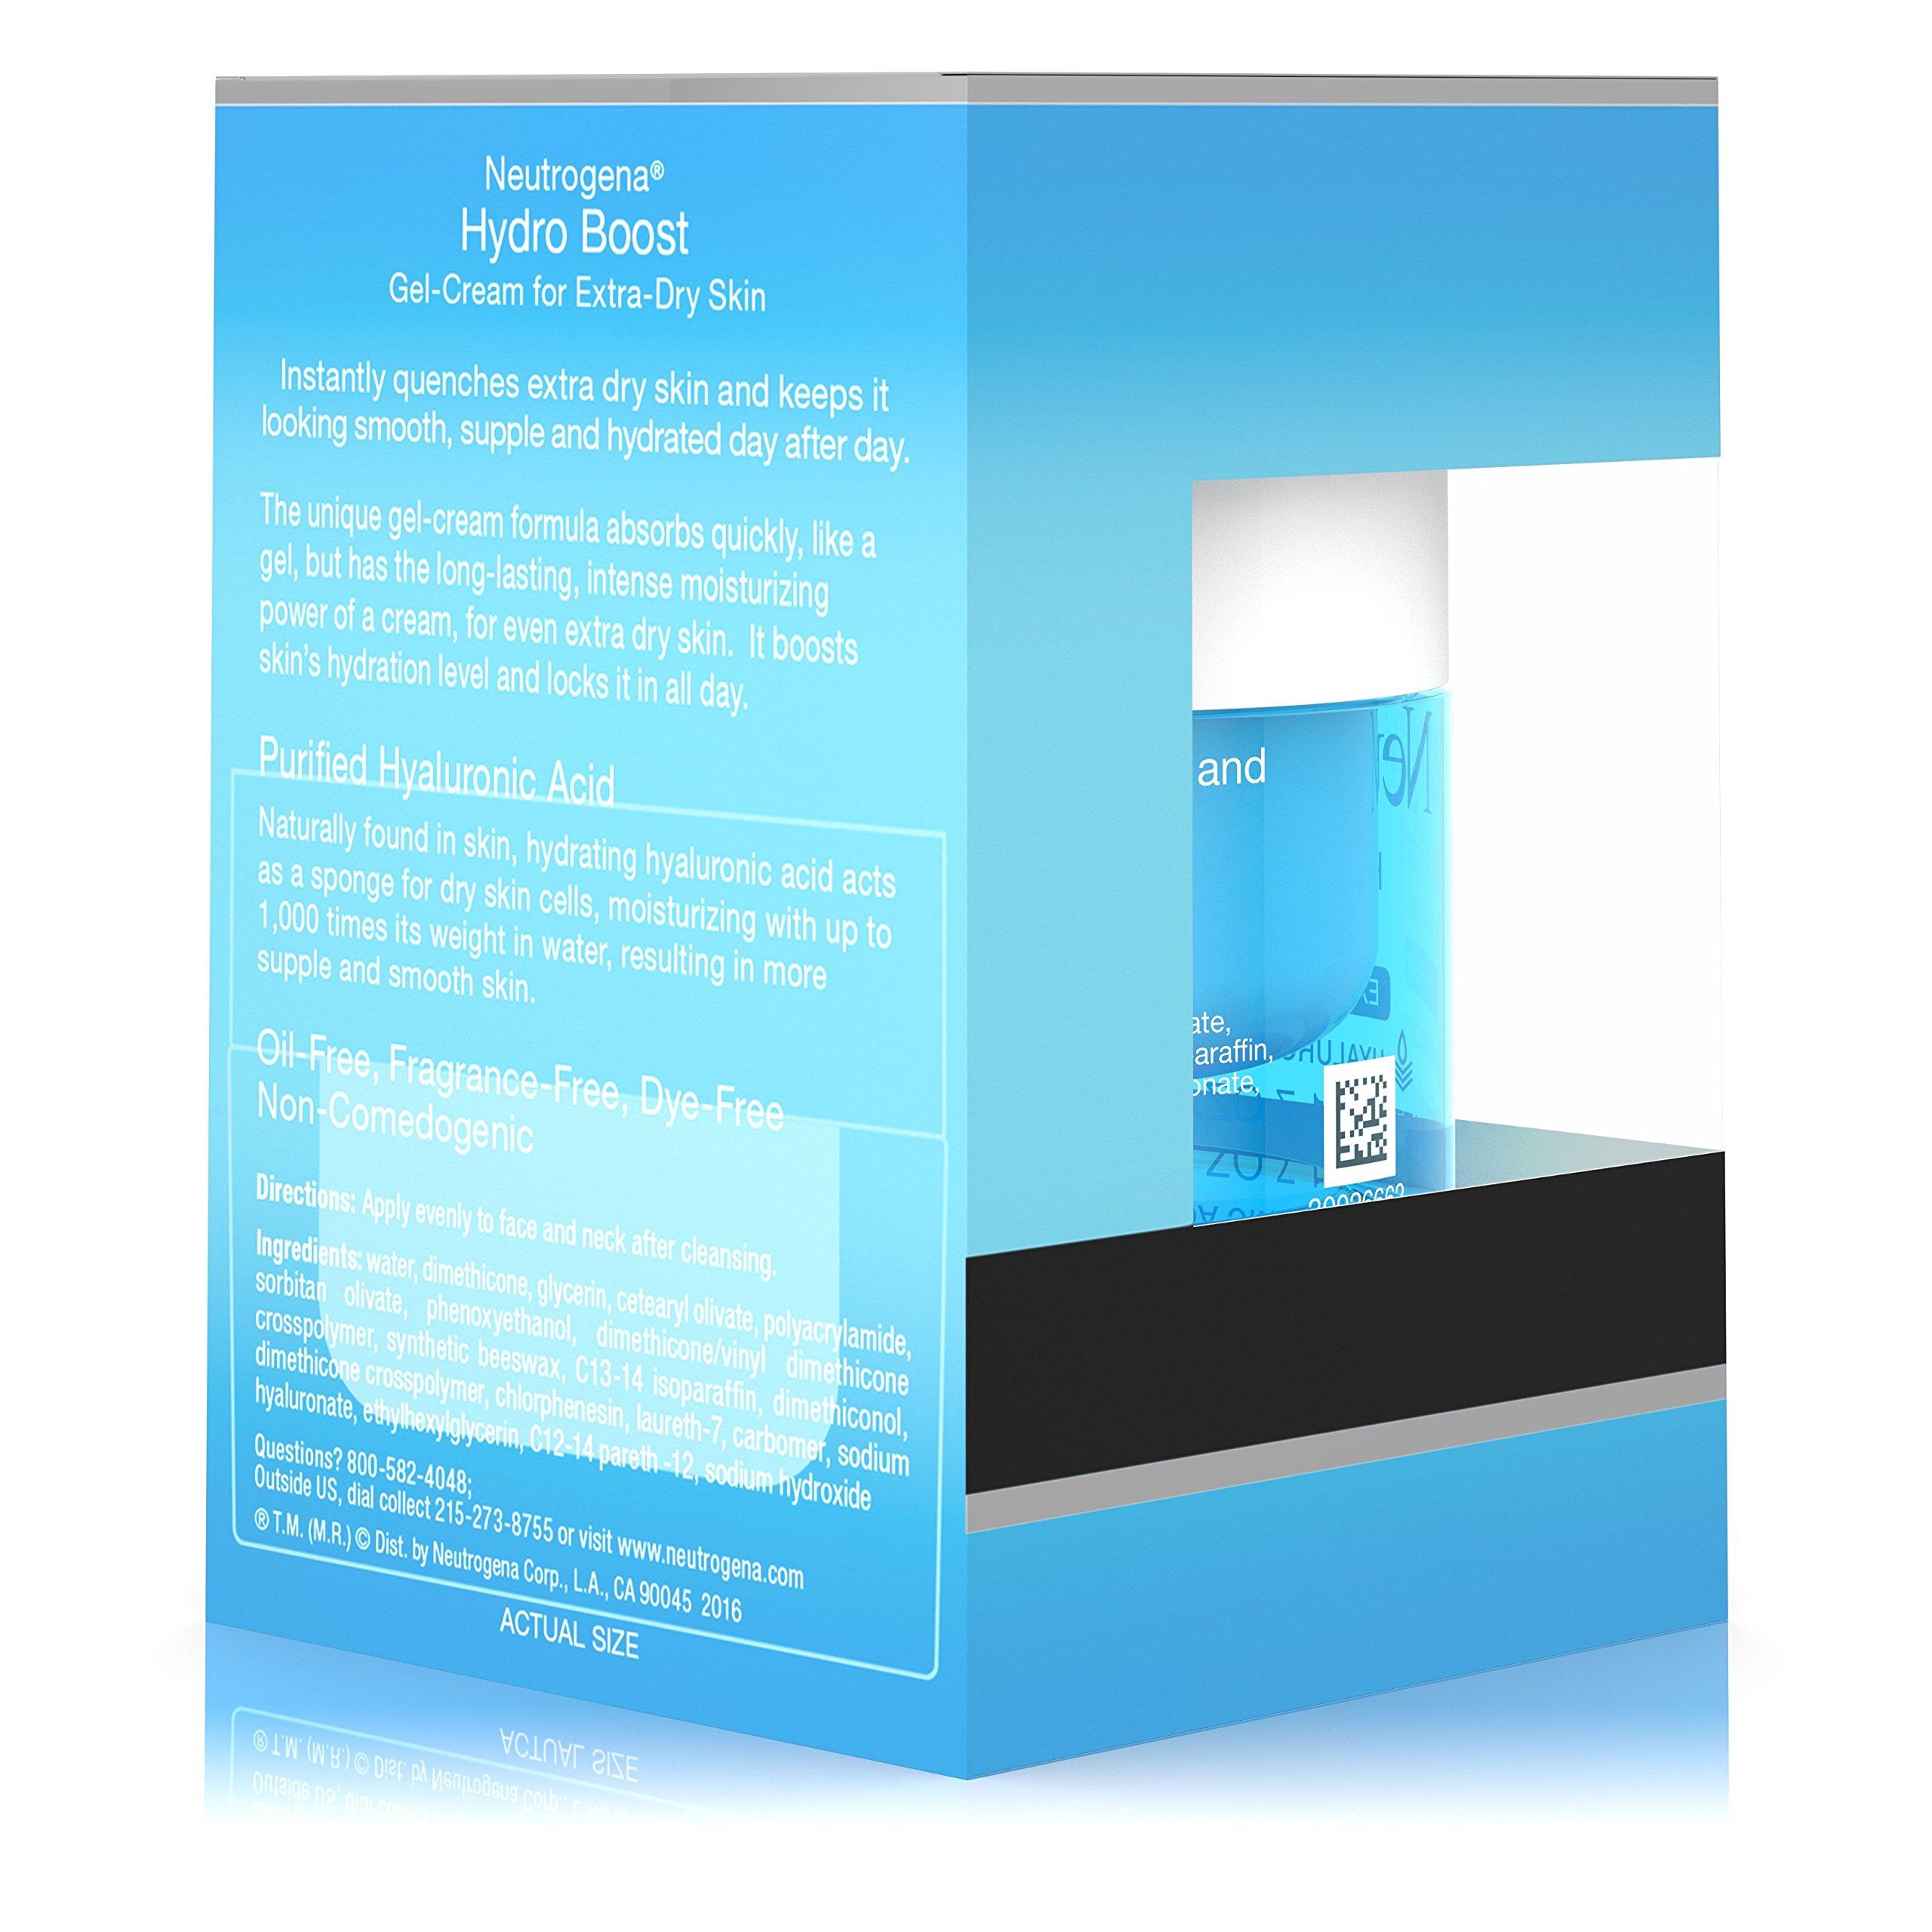 Neutrogena Hydro Boost Hyaluronic Acid Hydrating Face Moisturizer Gel-Cream to Hydrate and Smooth Extra-Dry Skin, 1.7 oz by Neutrogena (Image #8)